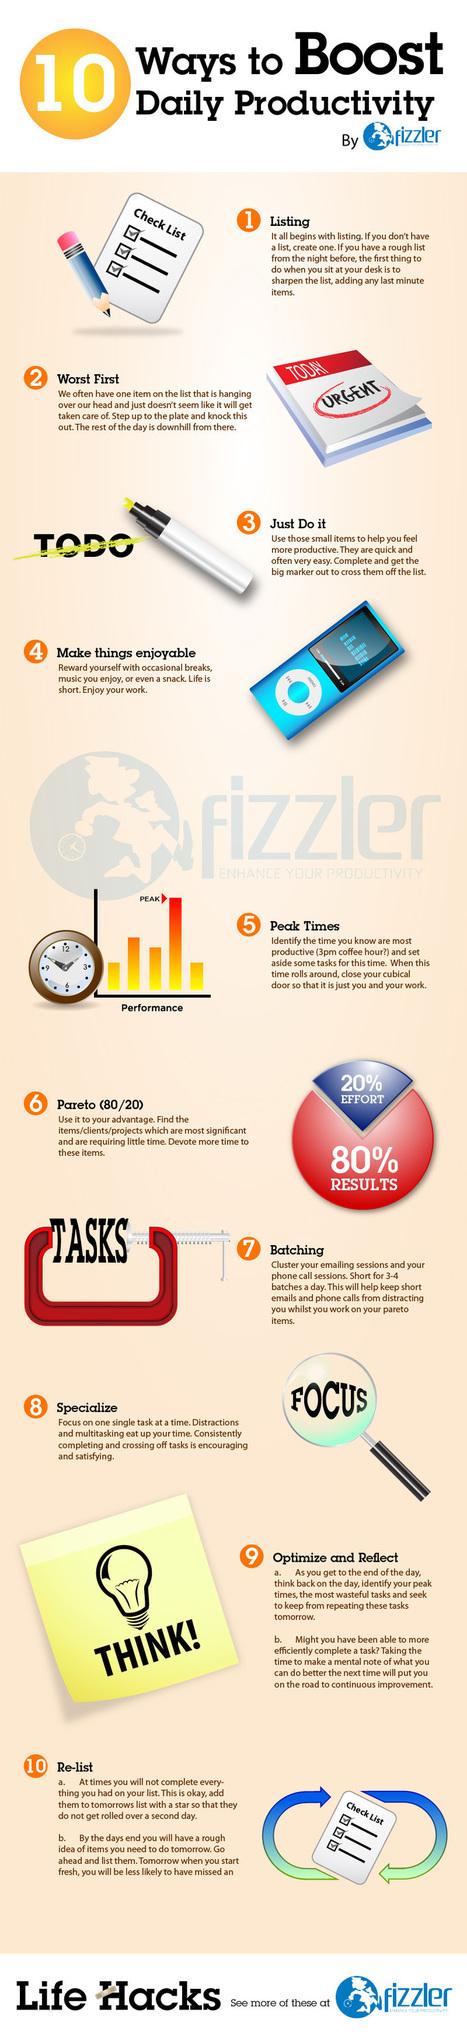 10 Ways to Boost Productivity - Lifehack | lifehacking | Scoop.it